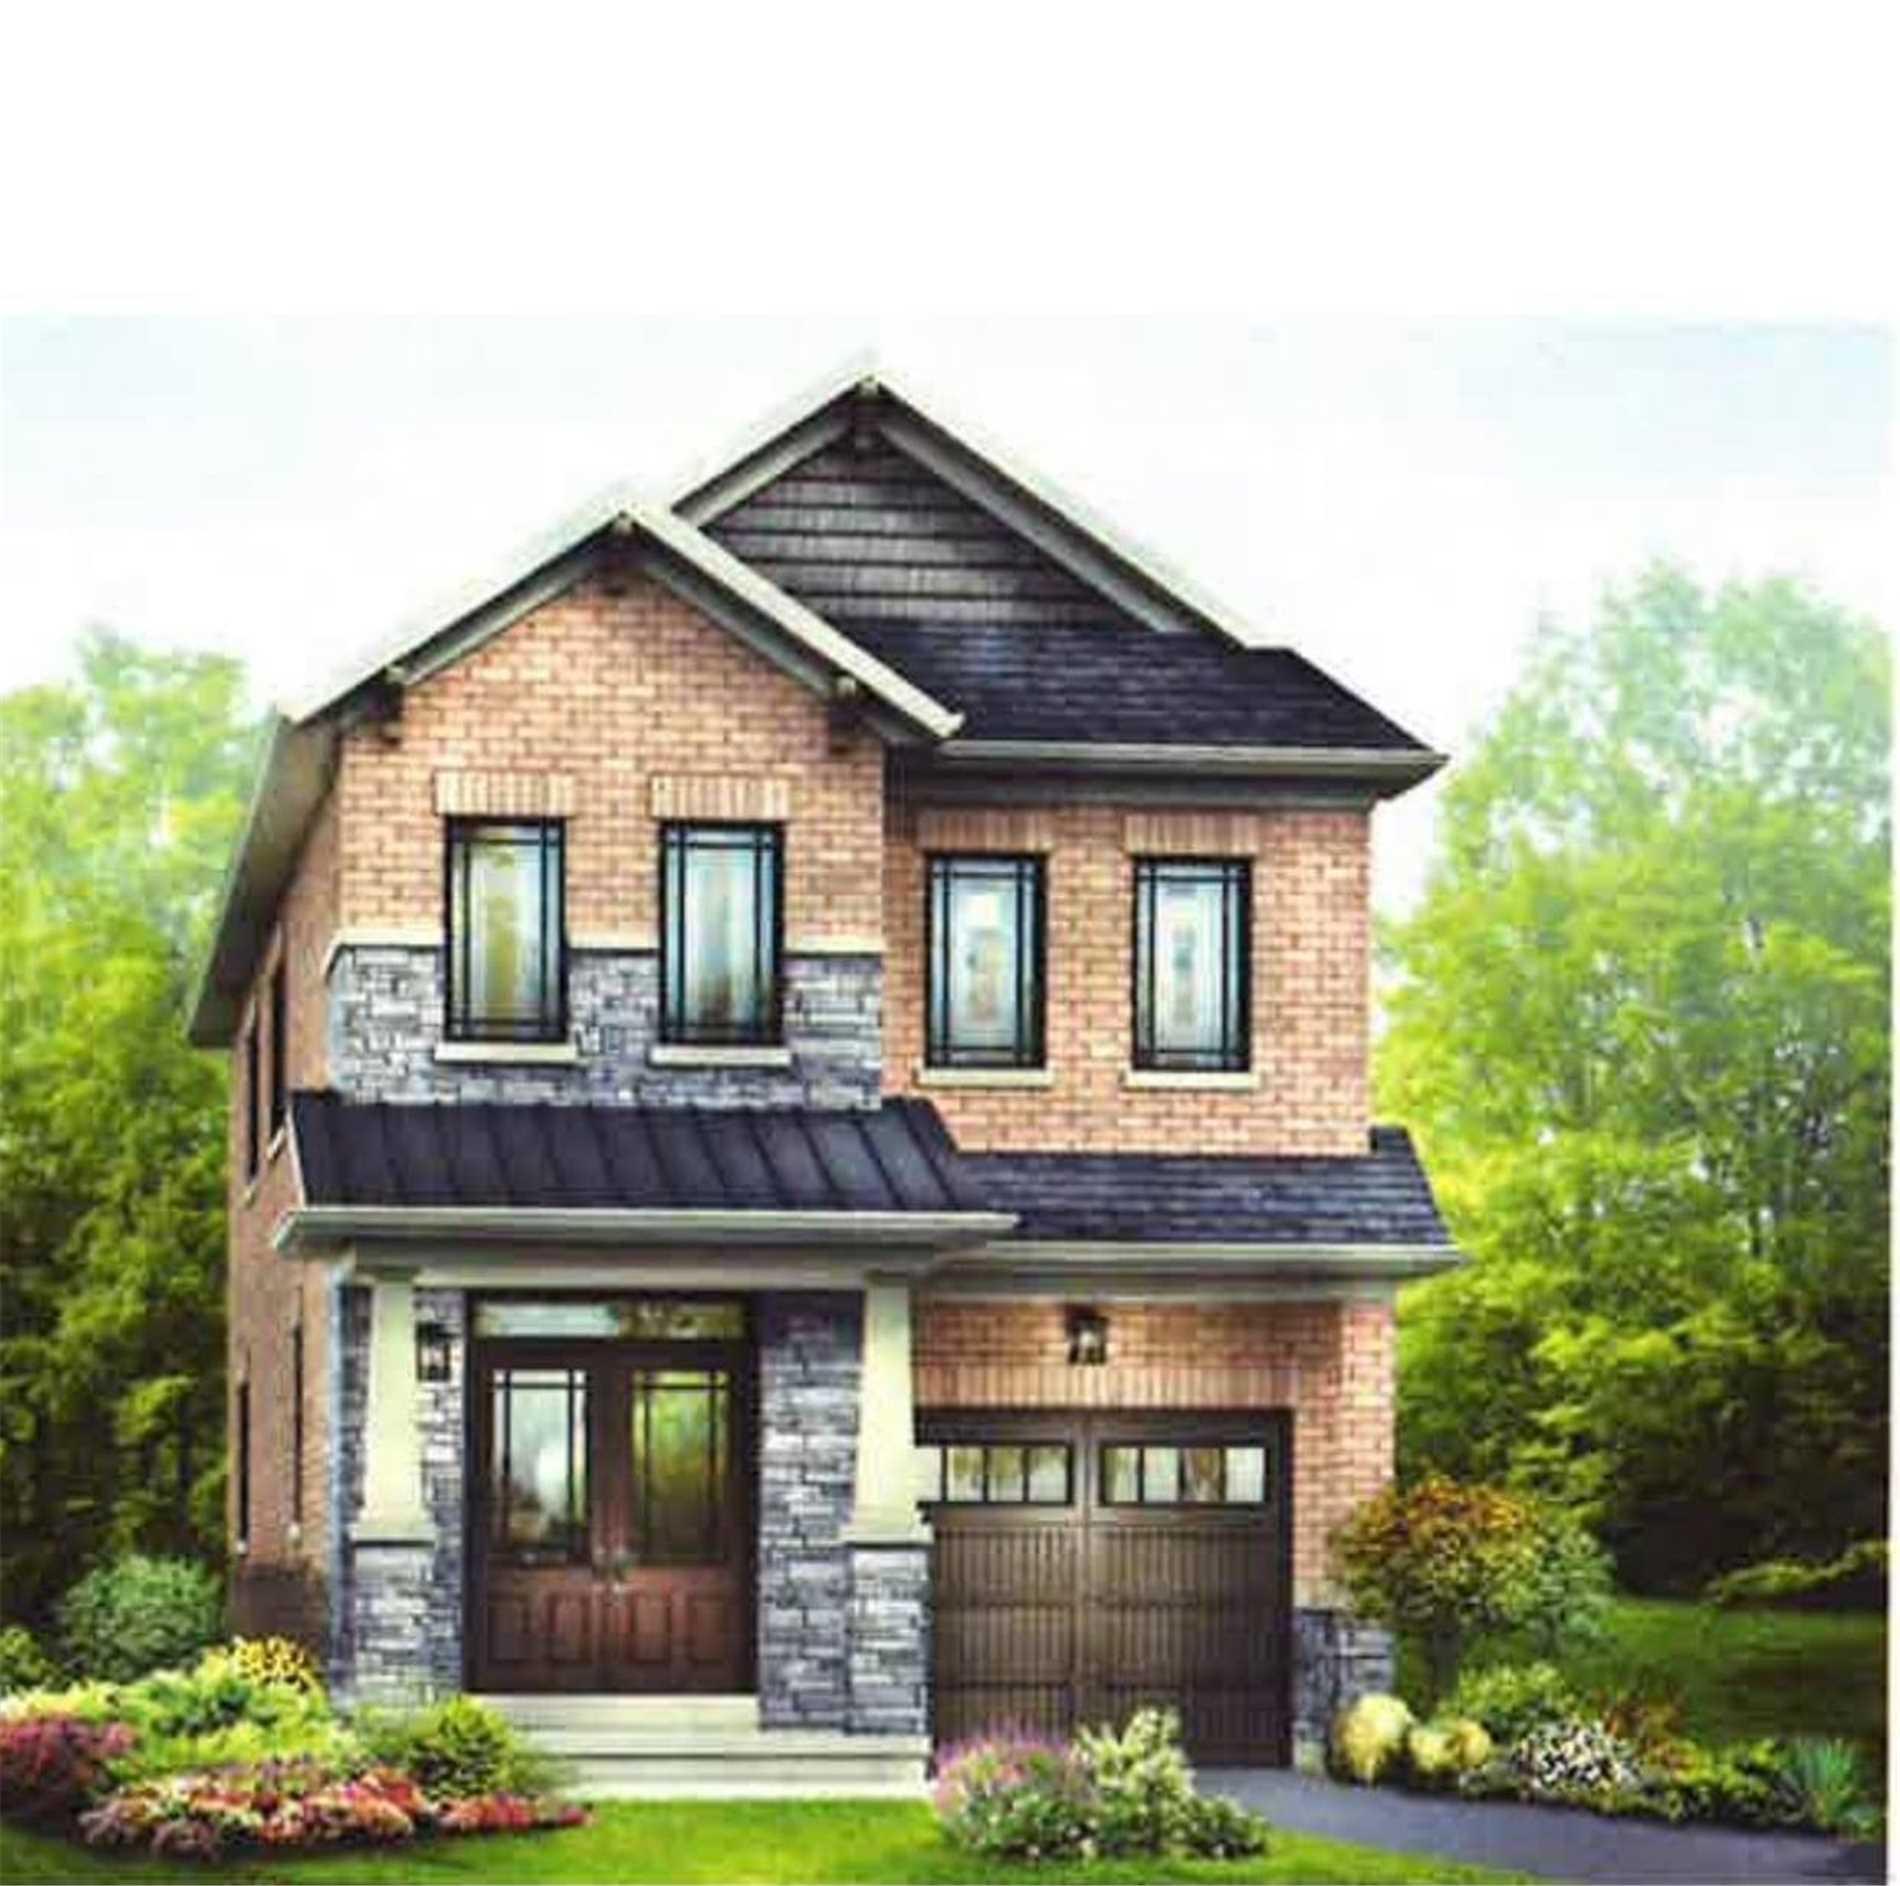 22 Amos Ave, Brantford, Ontario N3T0S2, 4 Bedrooms Bedrooms, ,3 BathroomsBathrooms,Detached,For Sale,Amos,X5370664